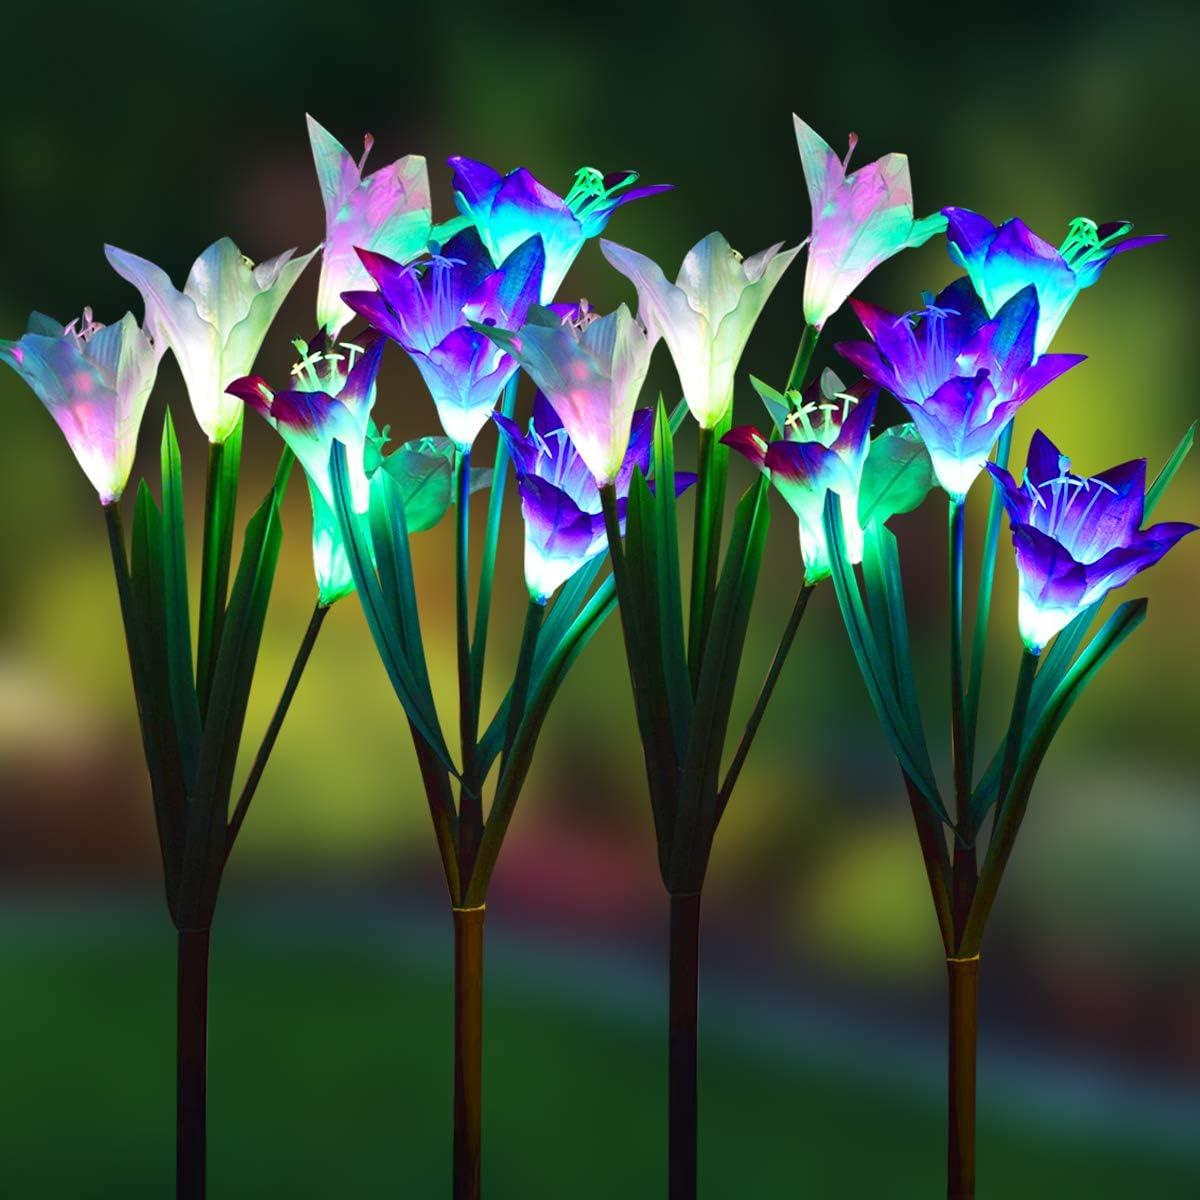 Solar Power Light Warm Light LED Landscape Lamp Flower Pot Garden Decoration New